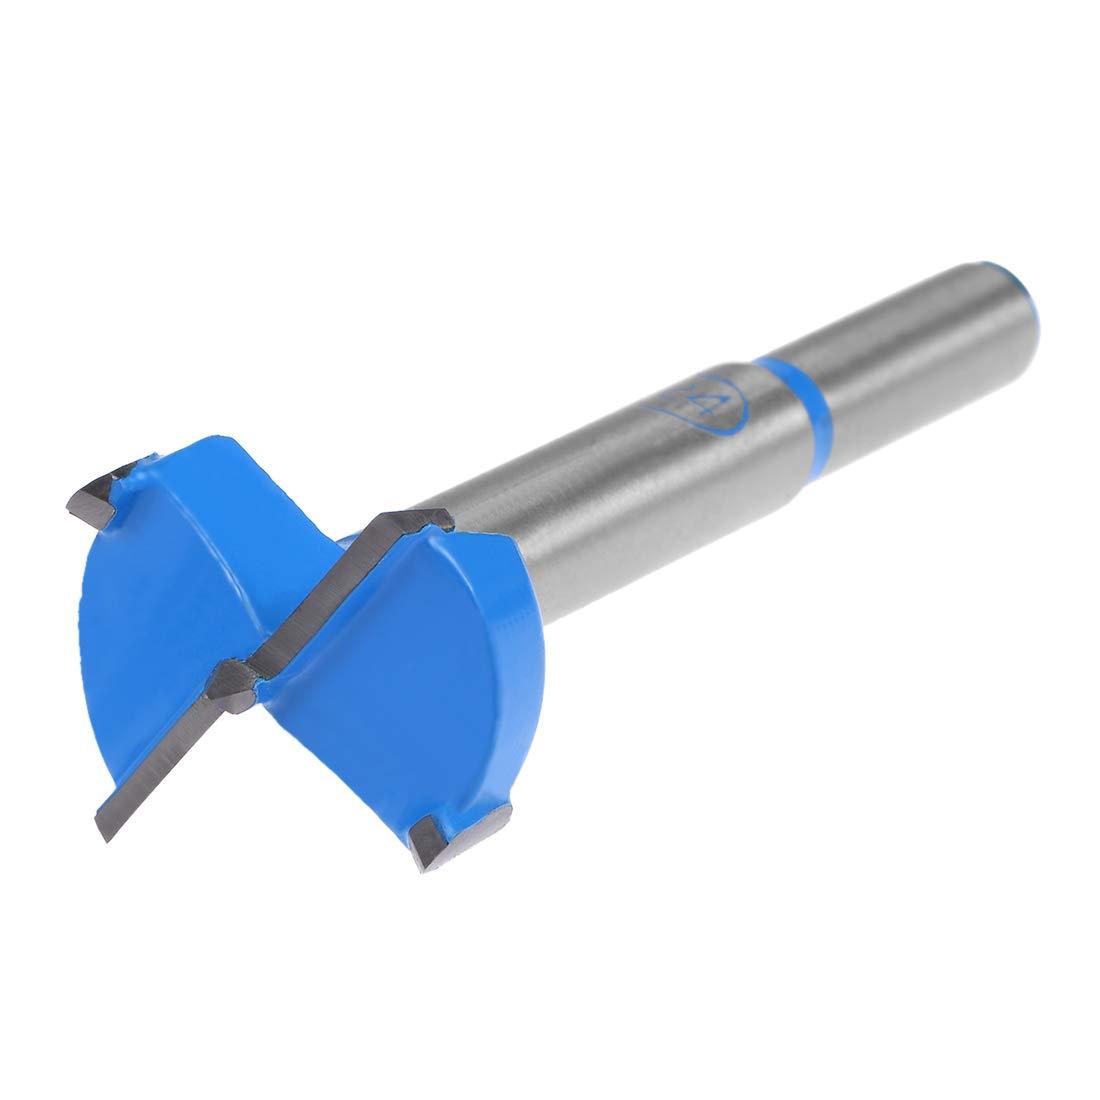 35mm Diameter 8mm Shank sourcingmap Carbide Hinge Boring Forstner Drill Bit